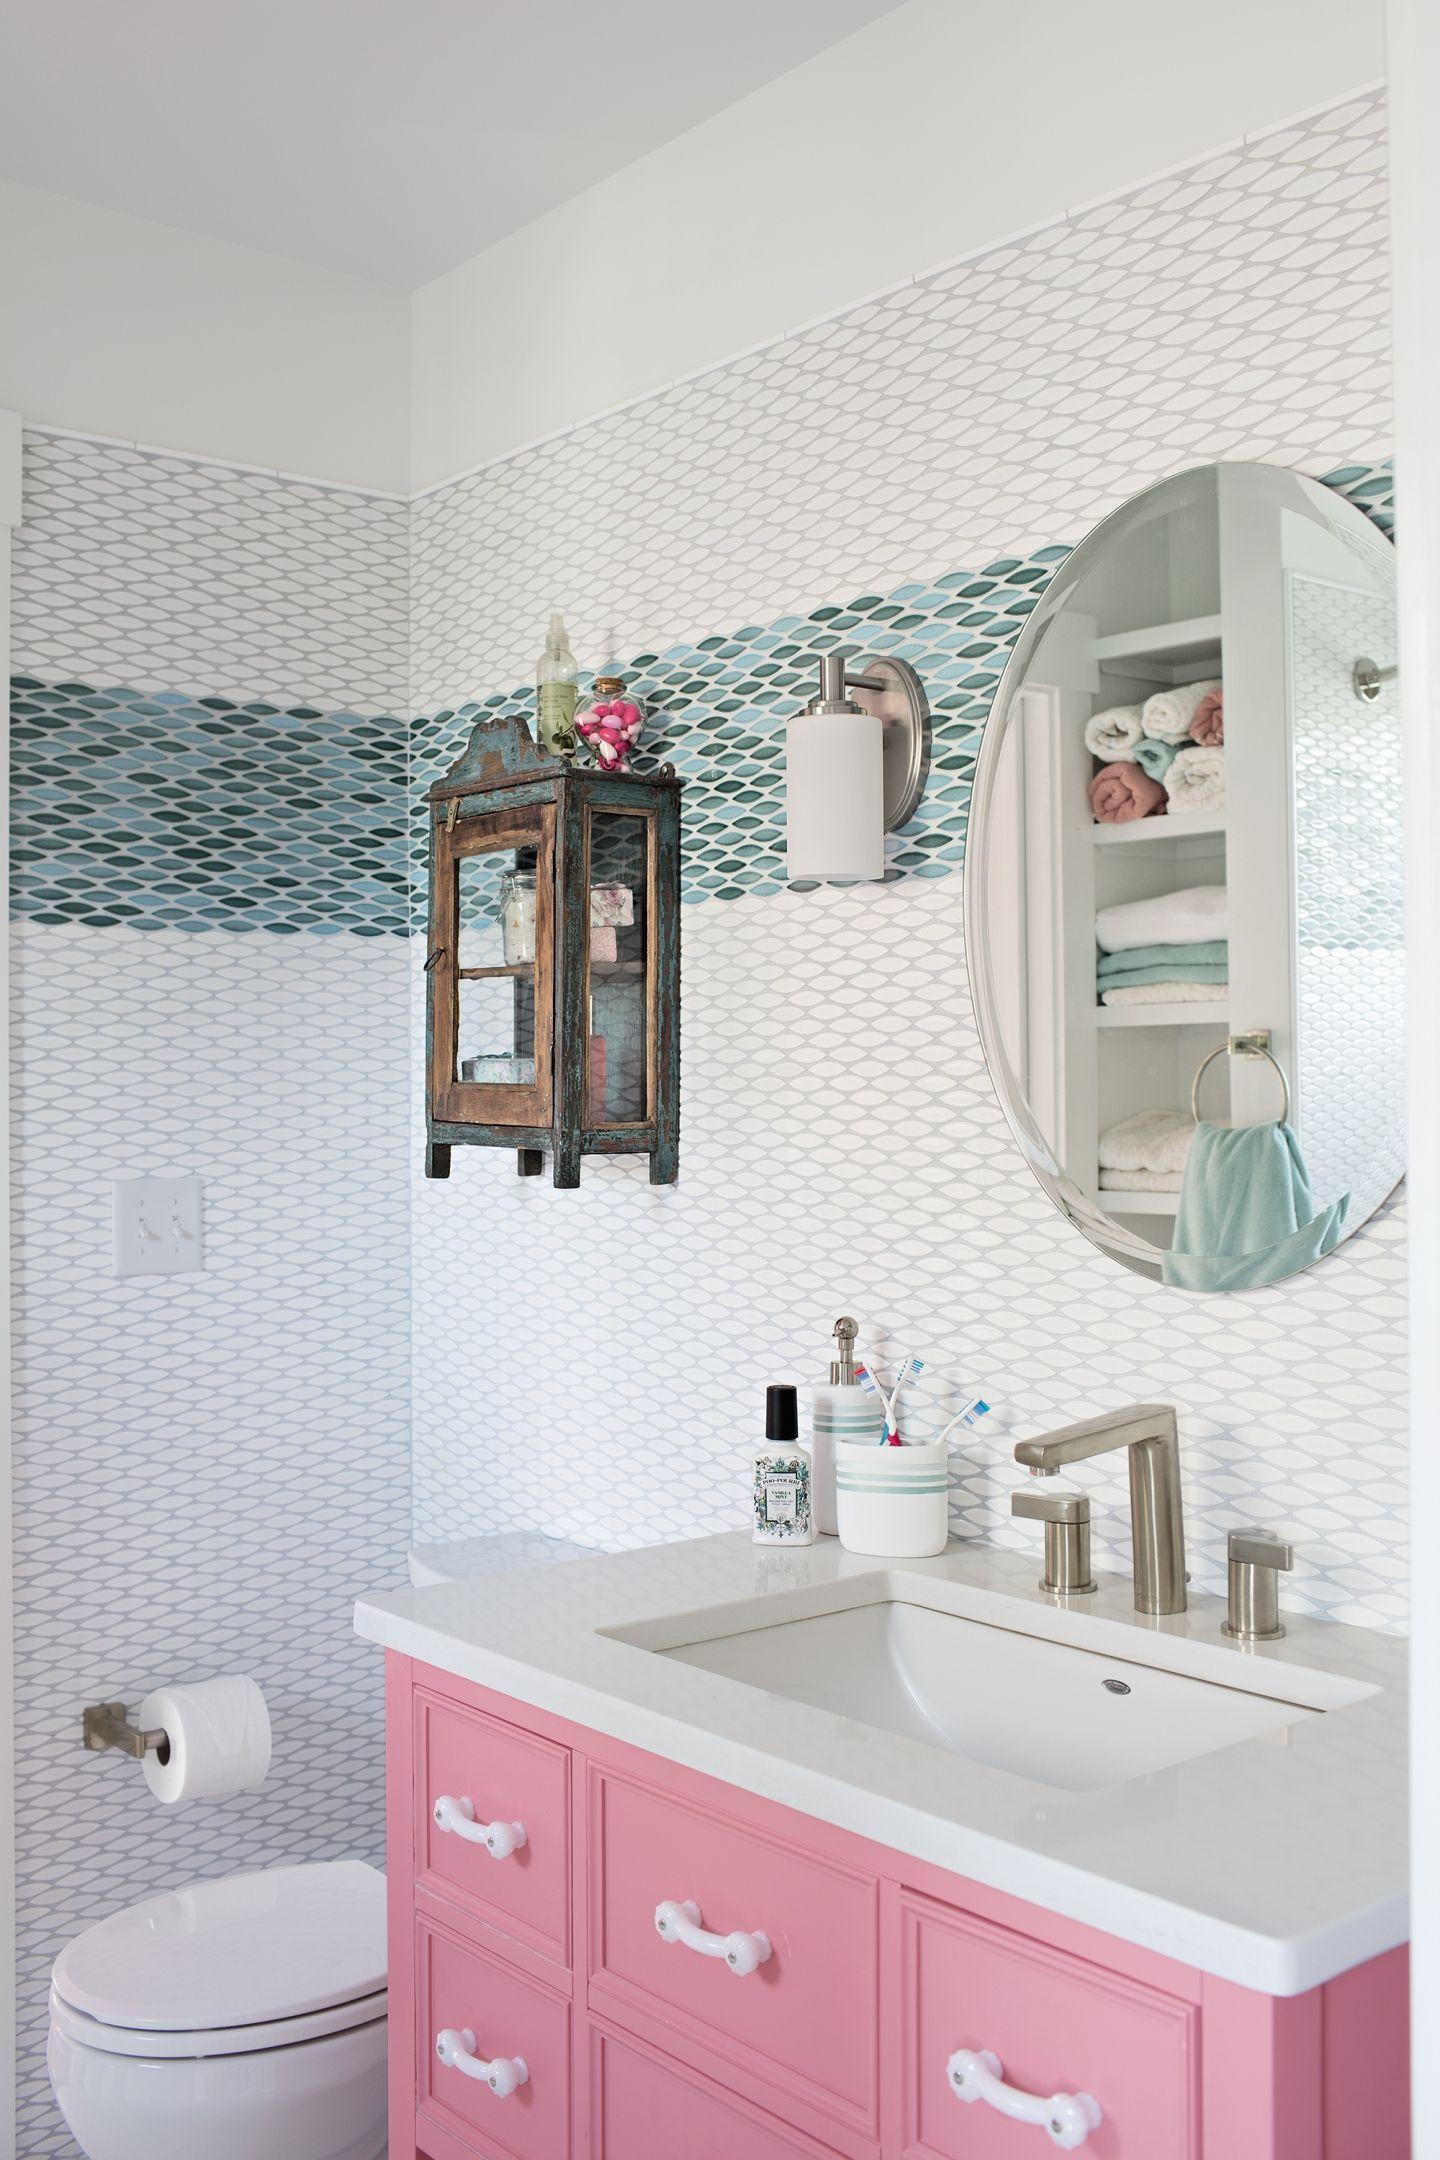 Highenergy color makes for fun interiors quartz vanity tops